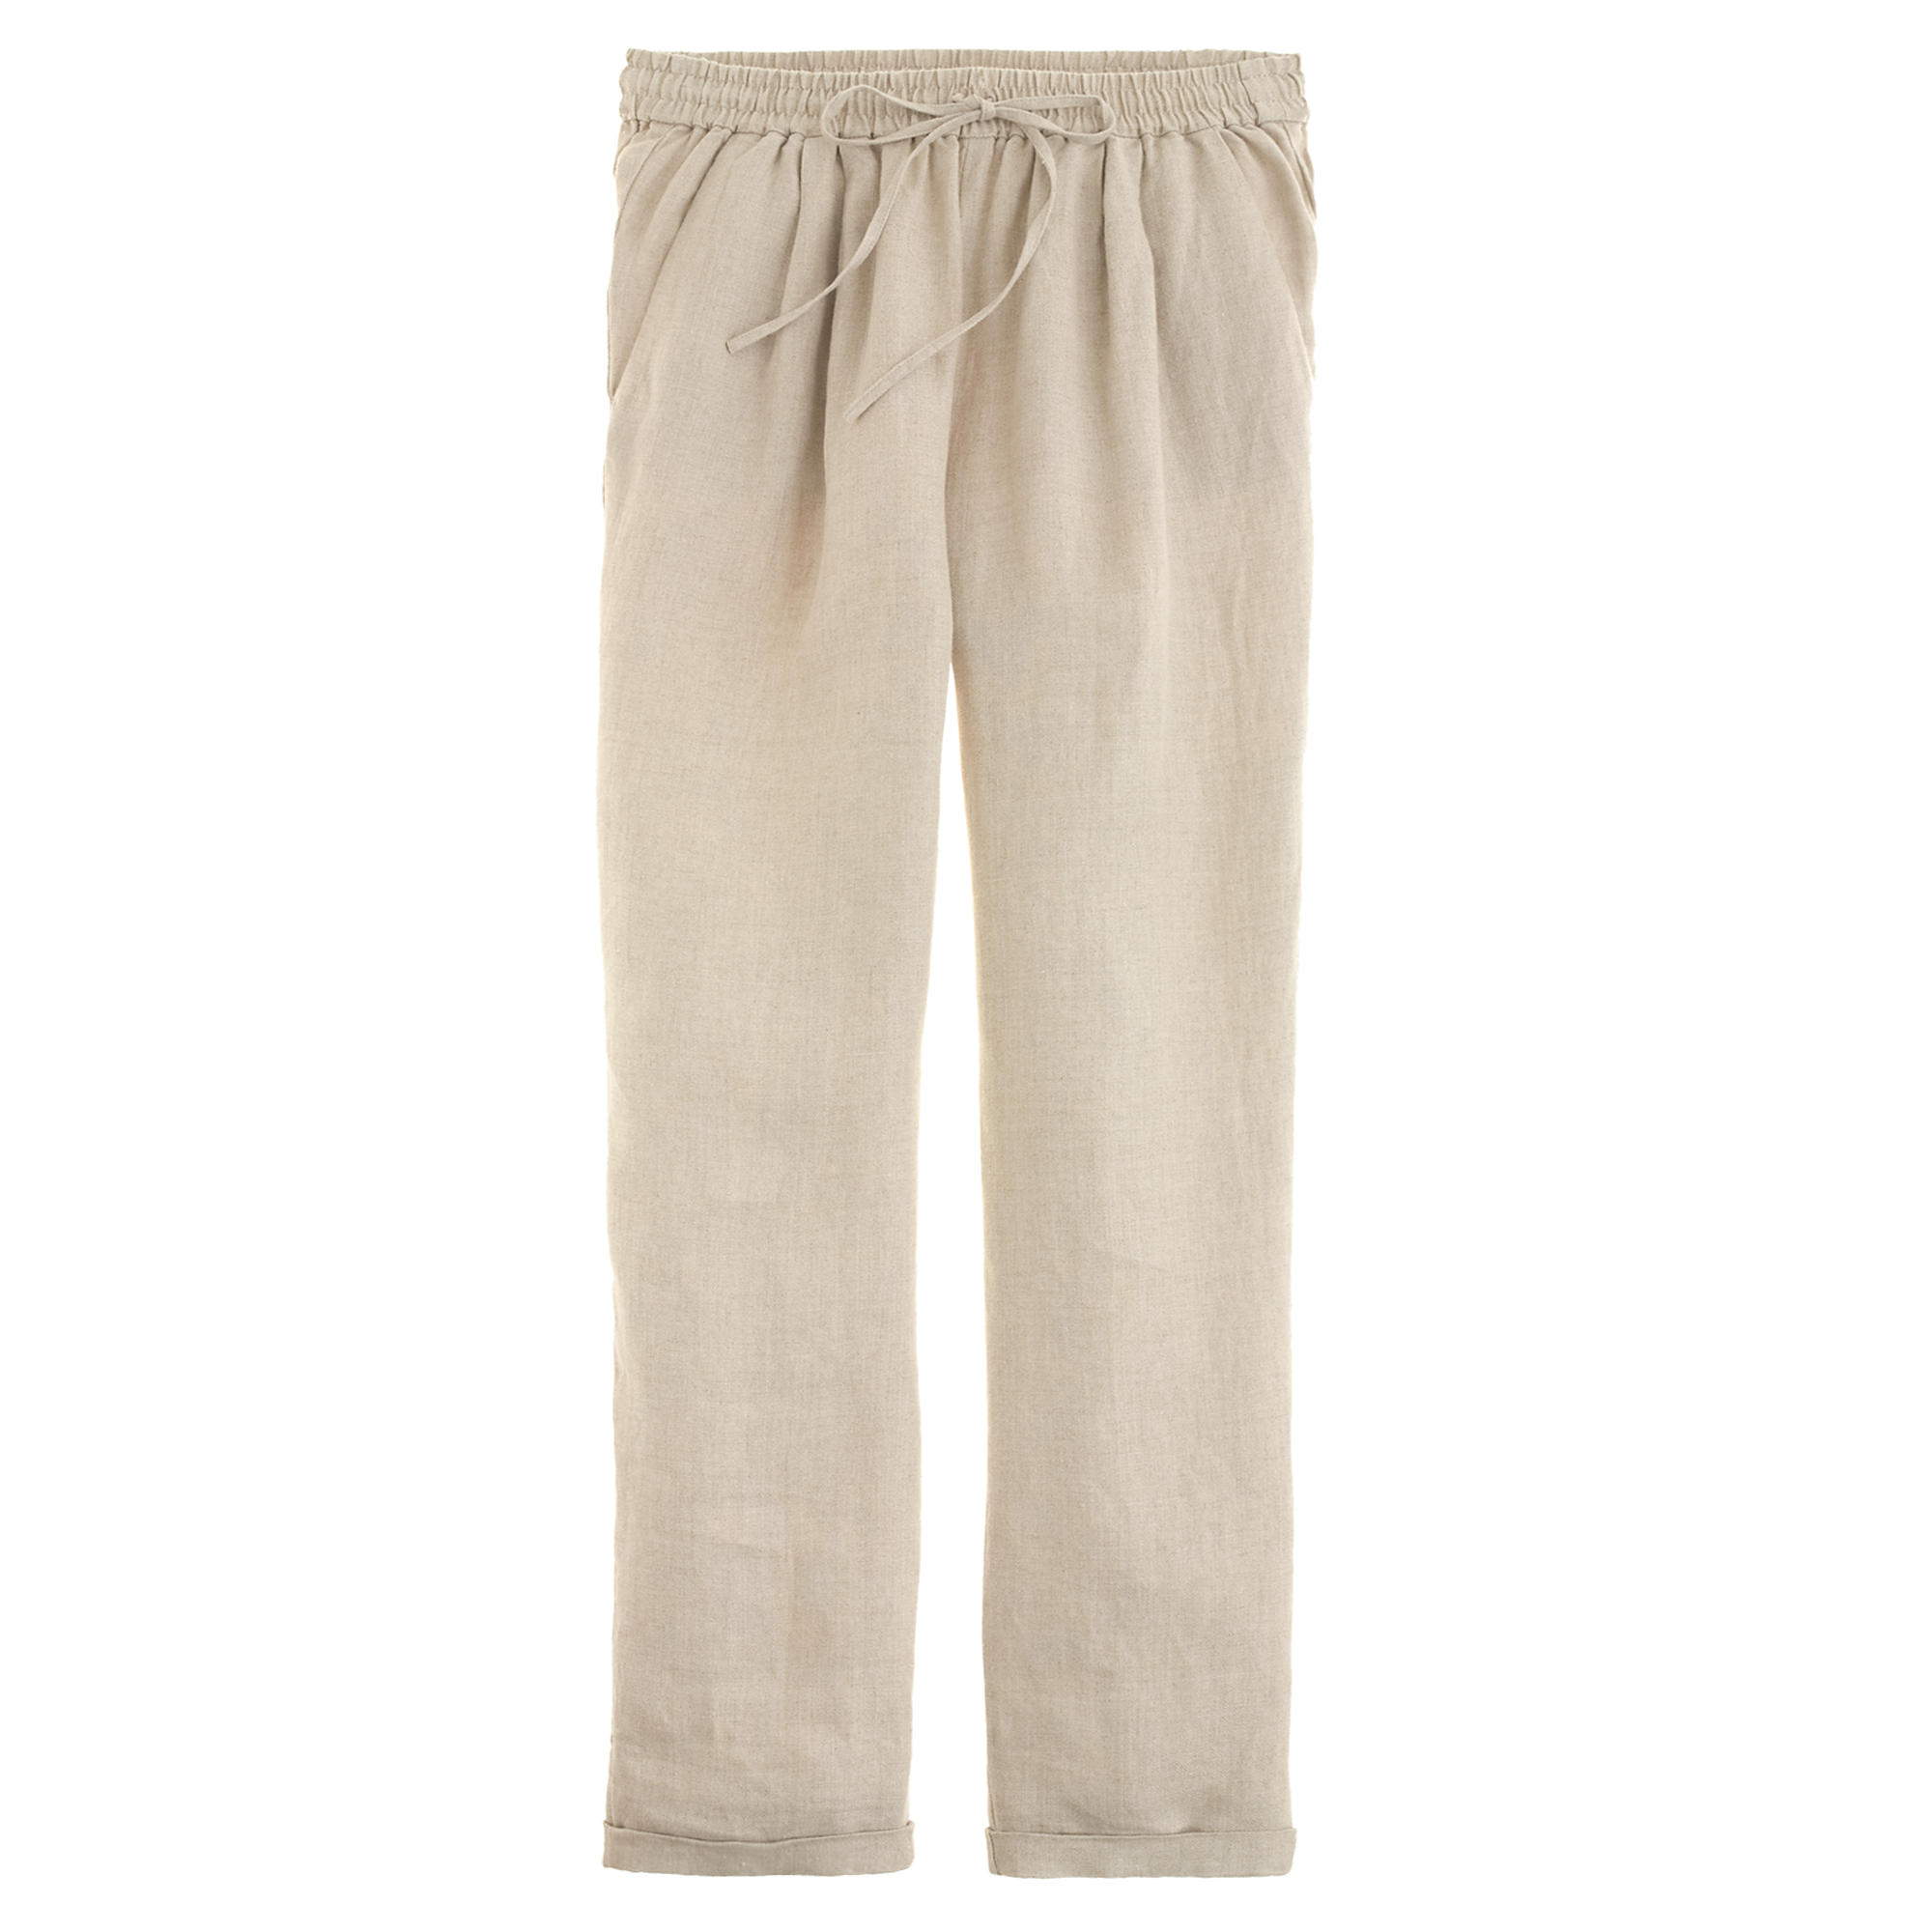 Linen Drawstring Pants | Gpant